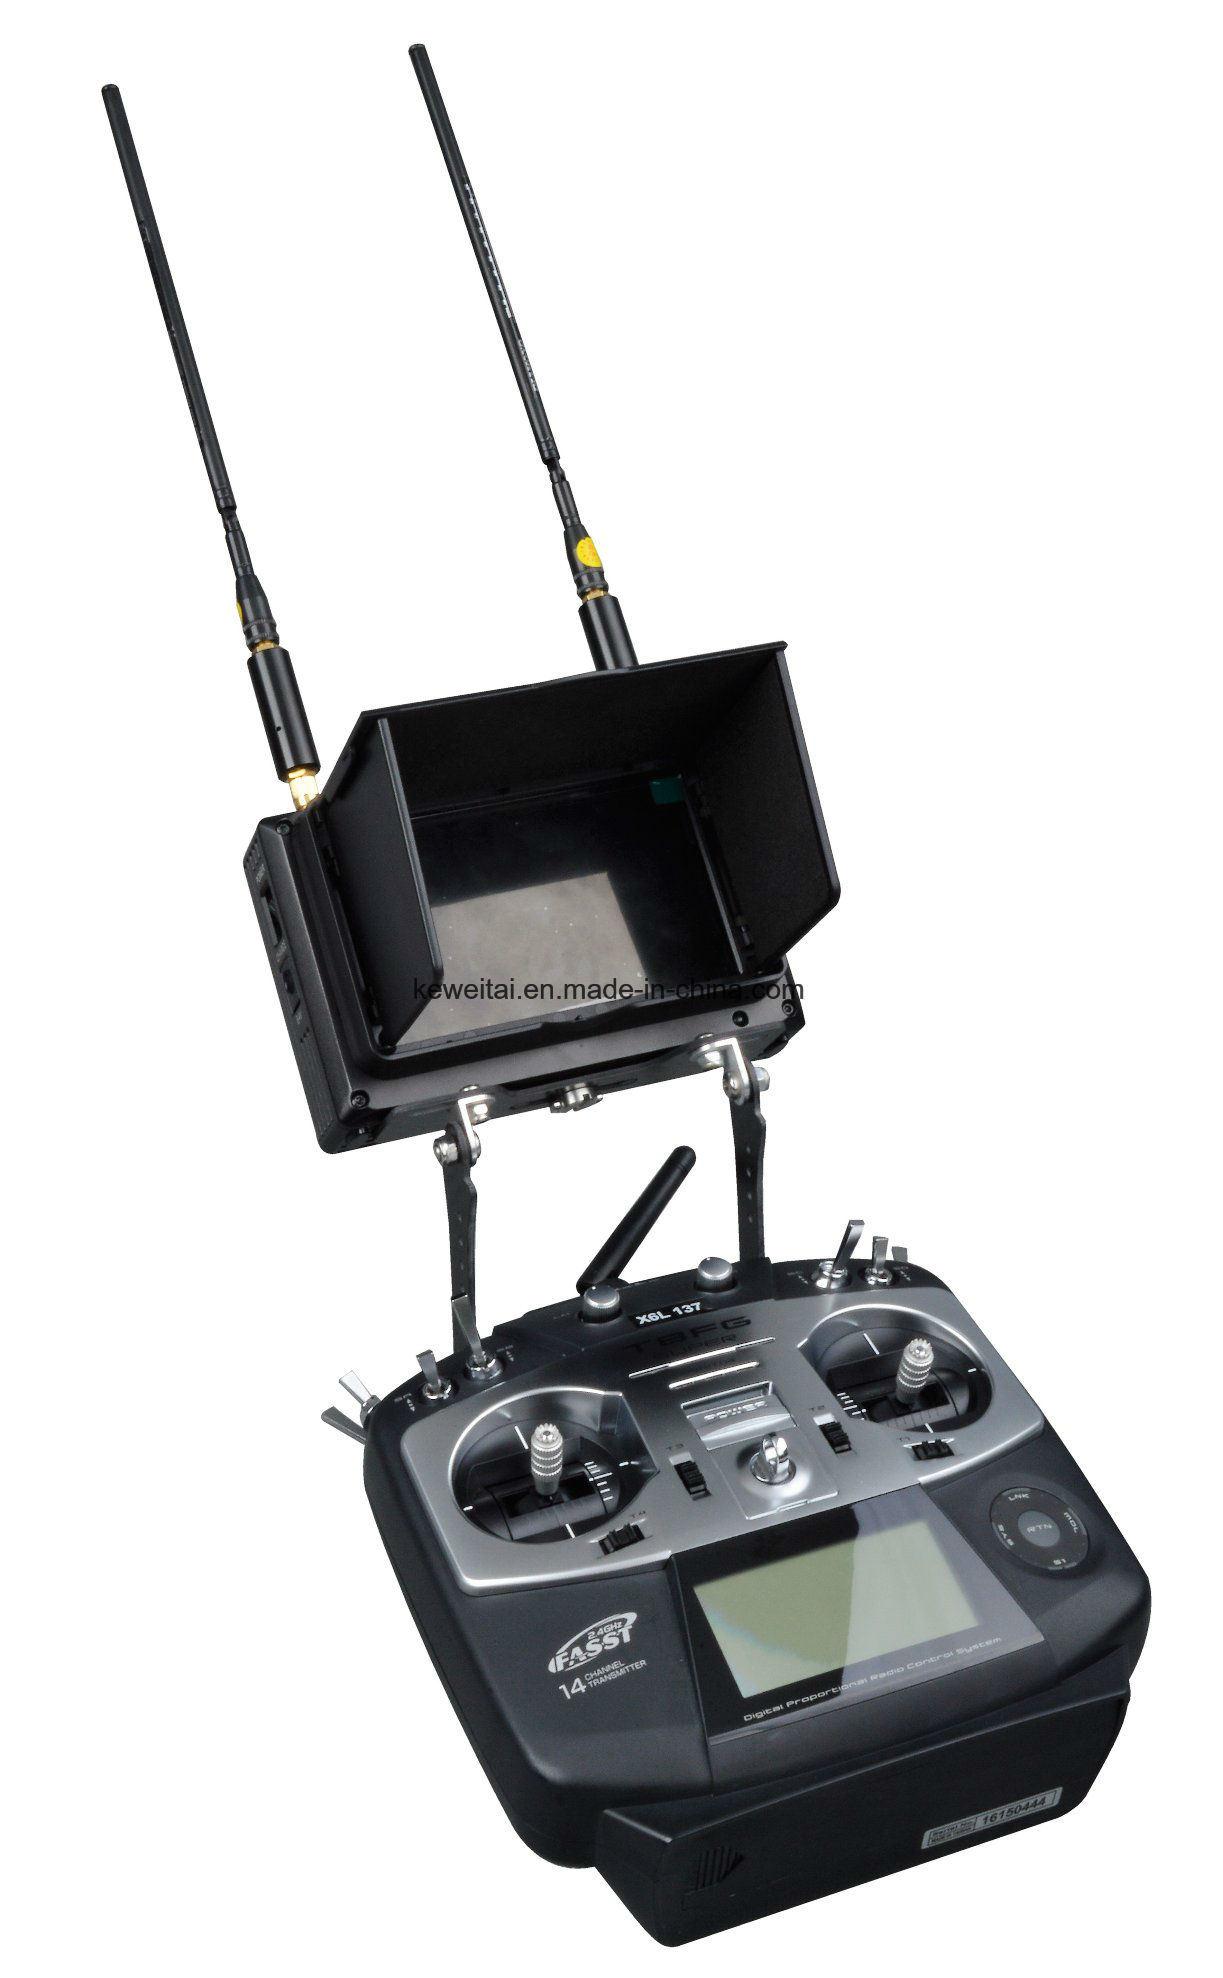 Fpv Cofdm Handheld Image Receiver